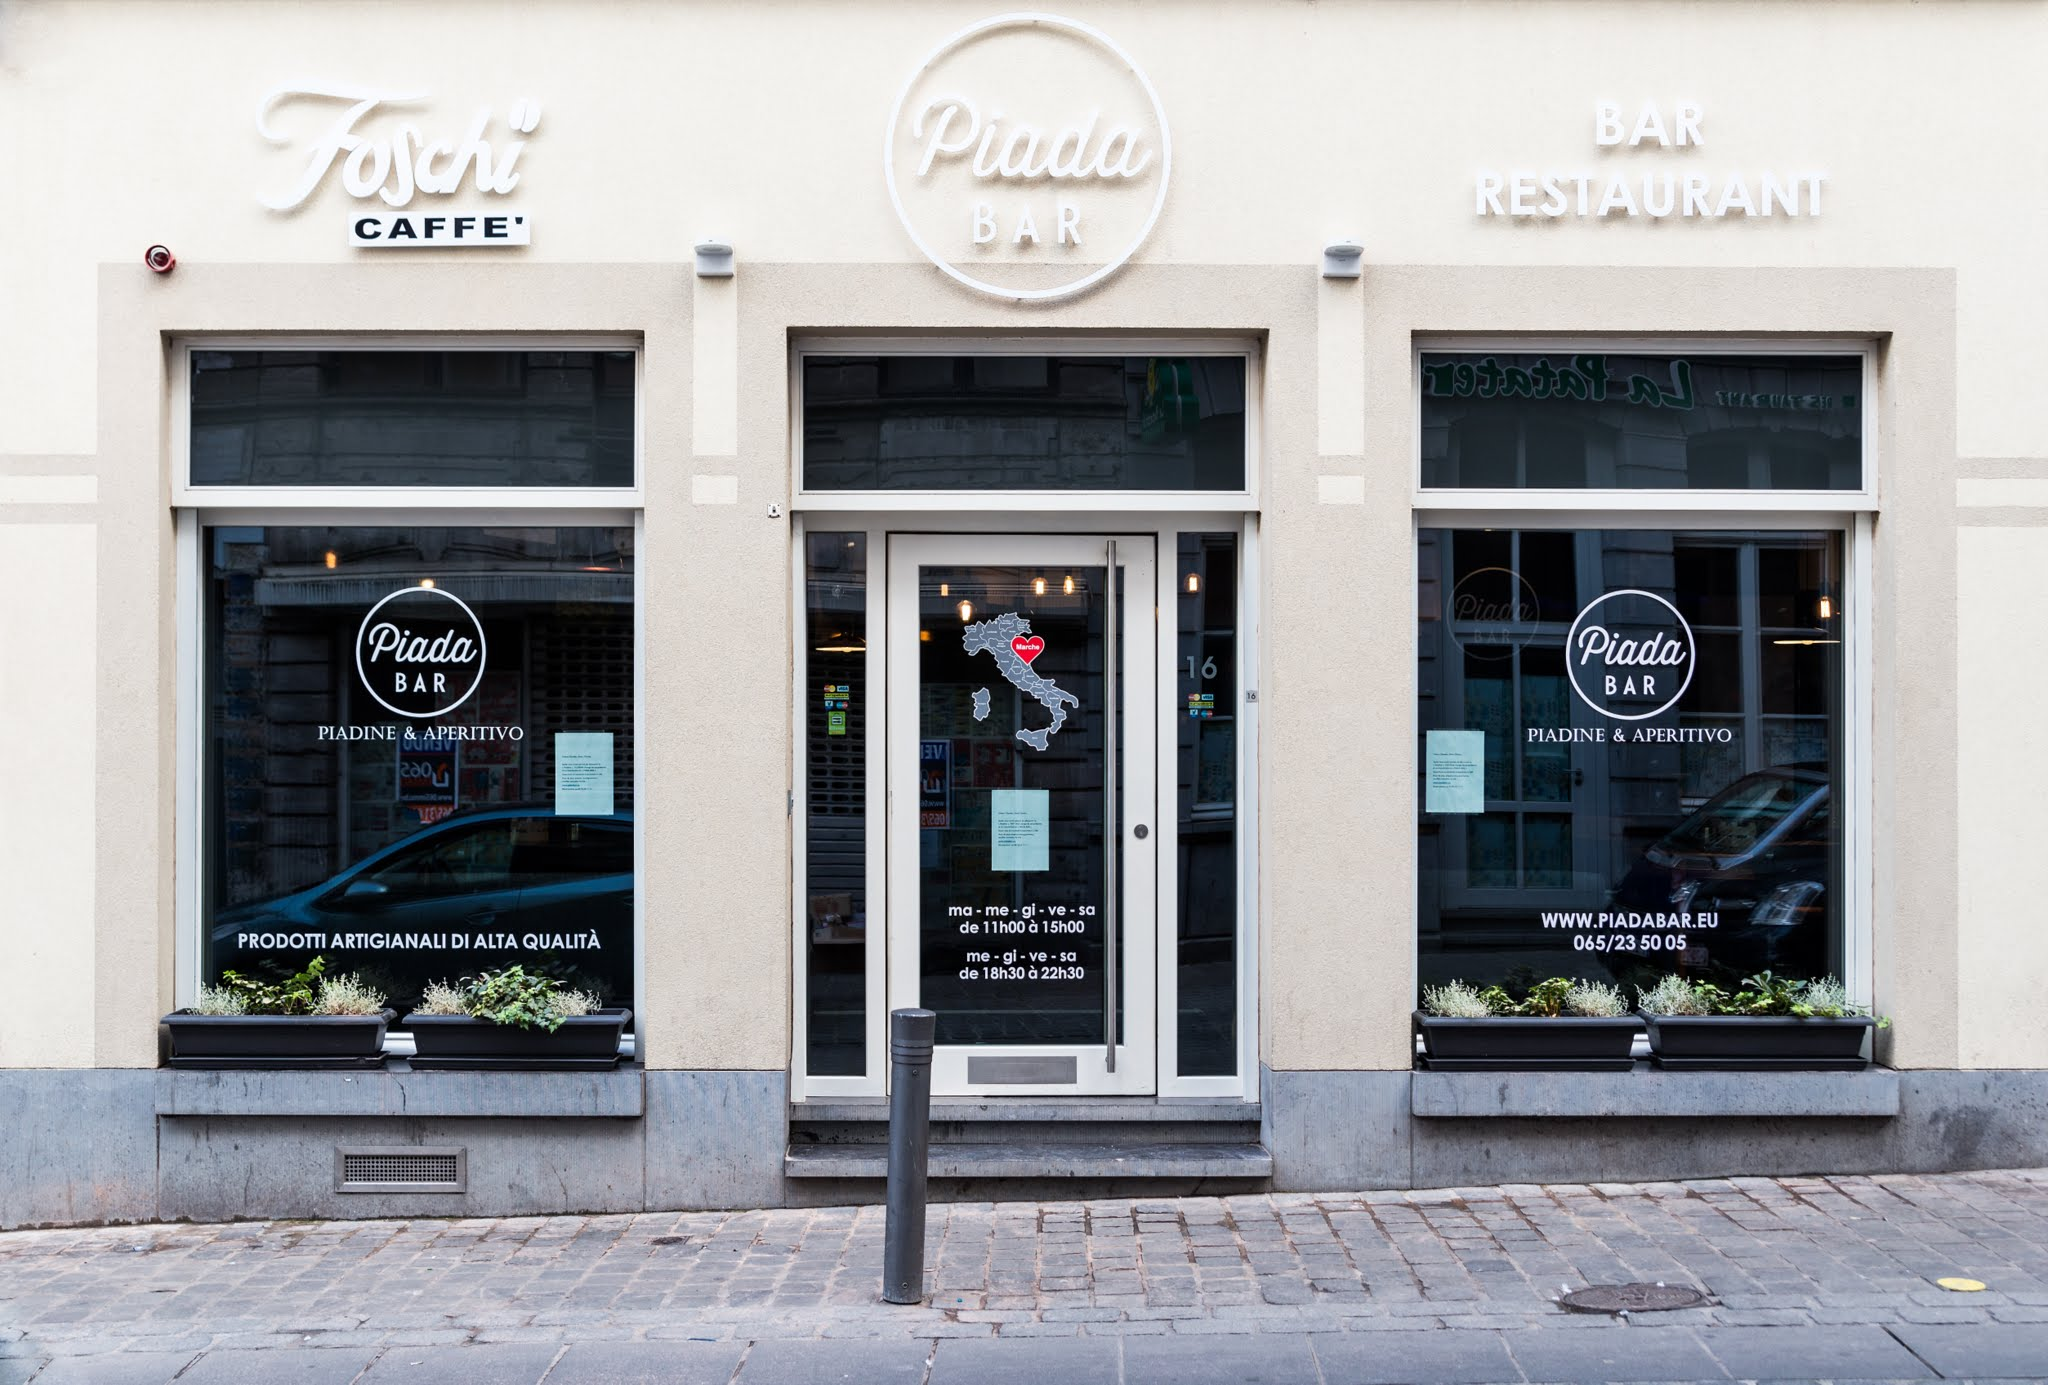 Piada bar Mons